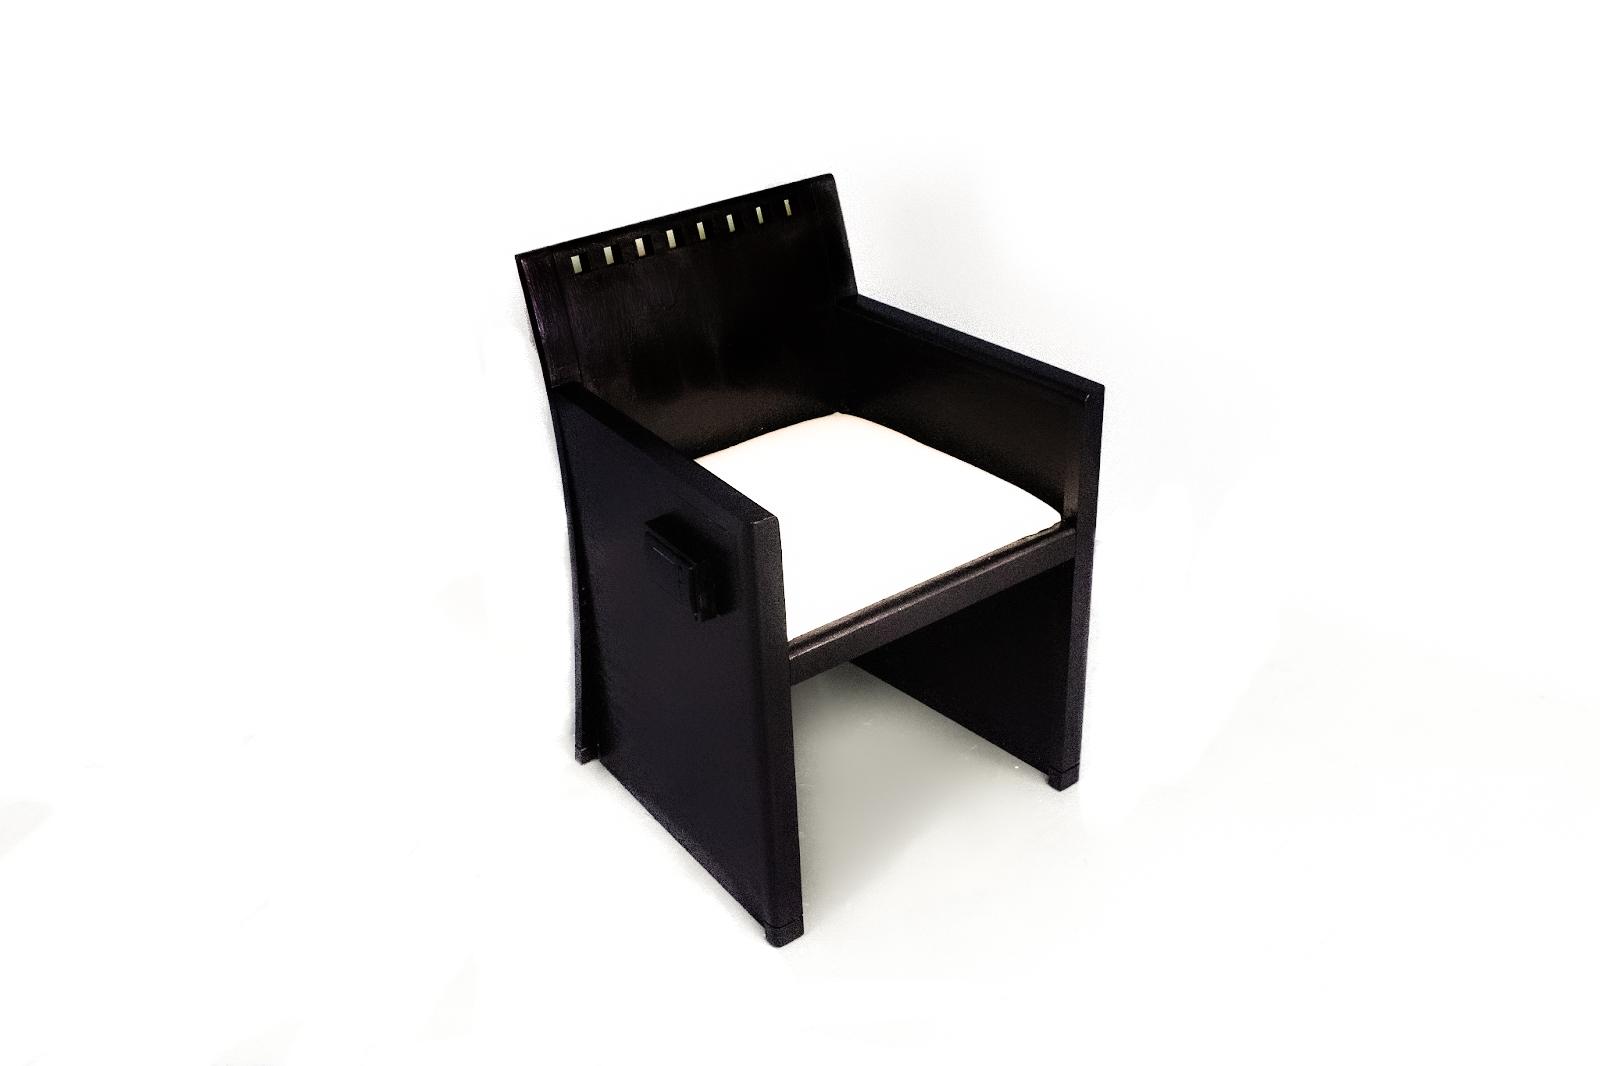 AhmedCalzado_Ponder_ChairShot-1-1